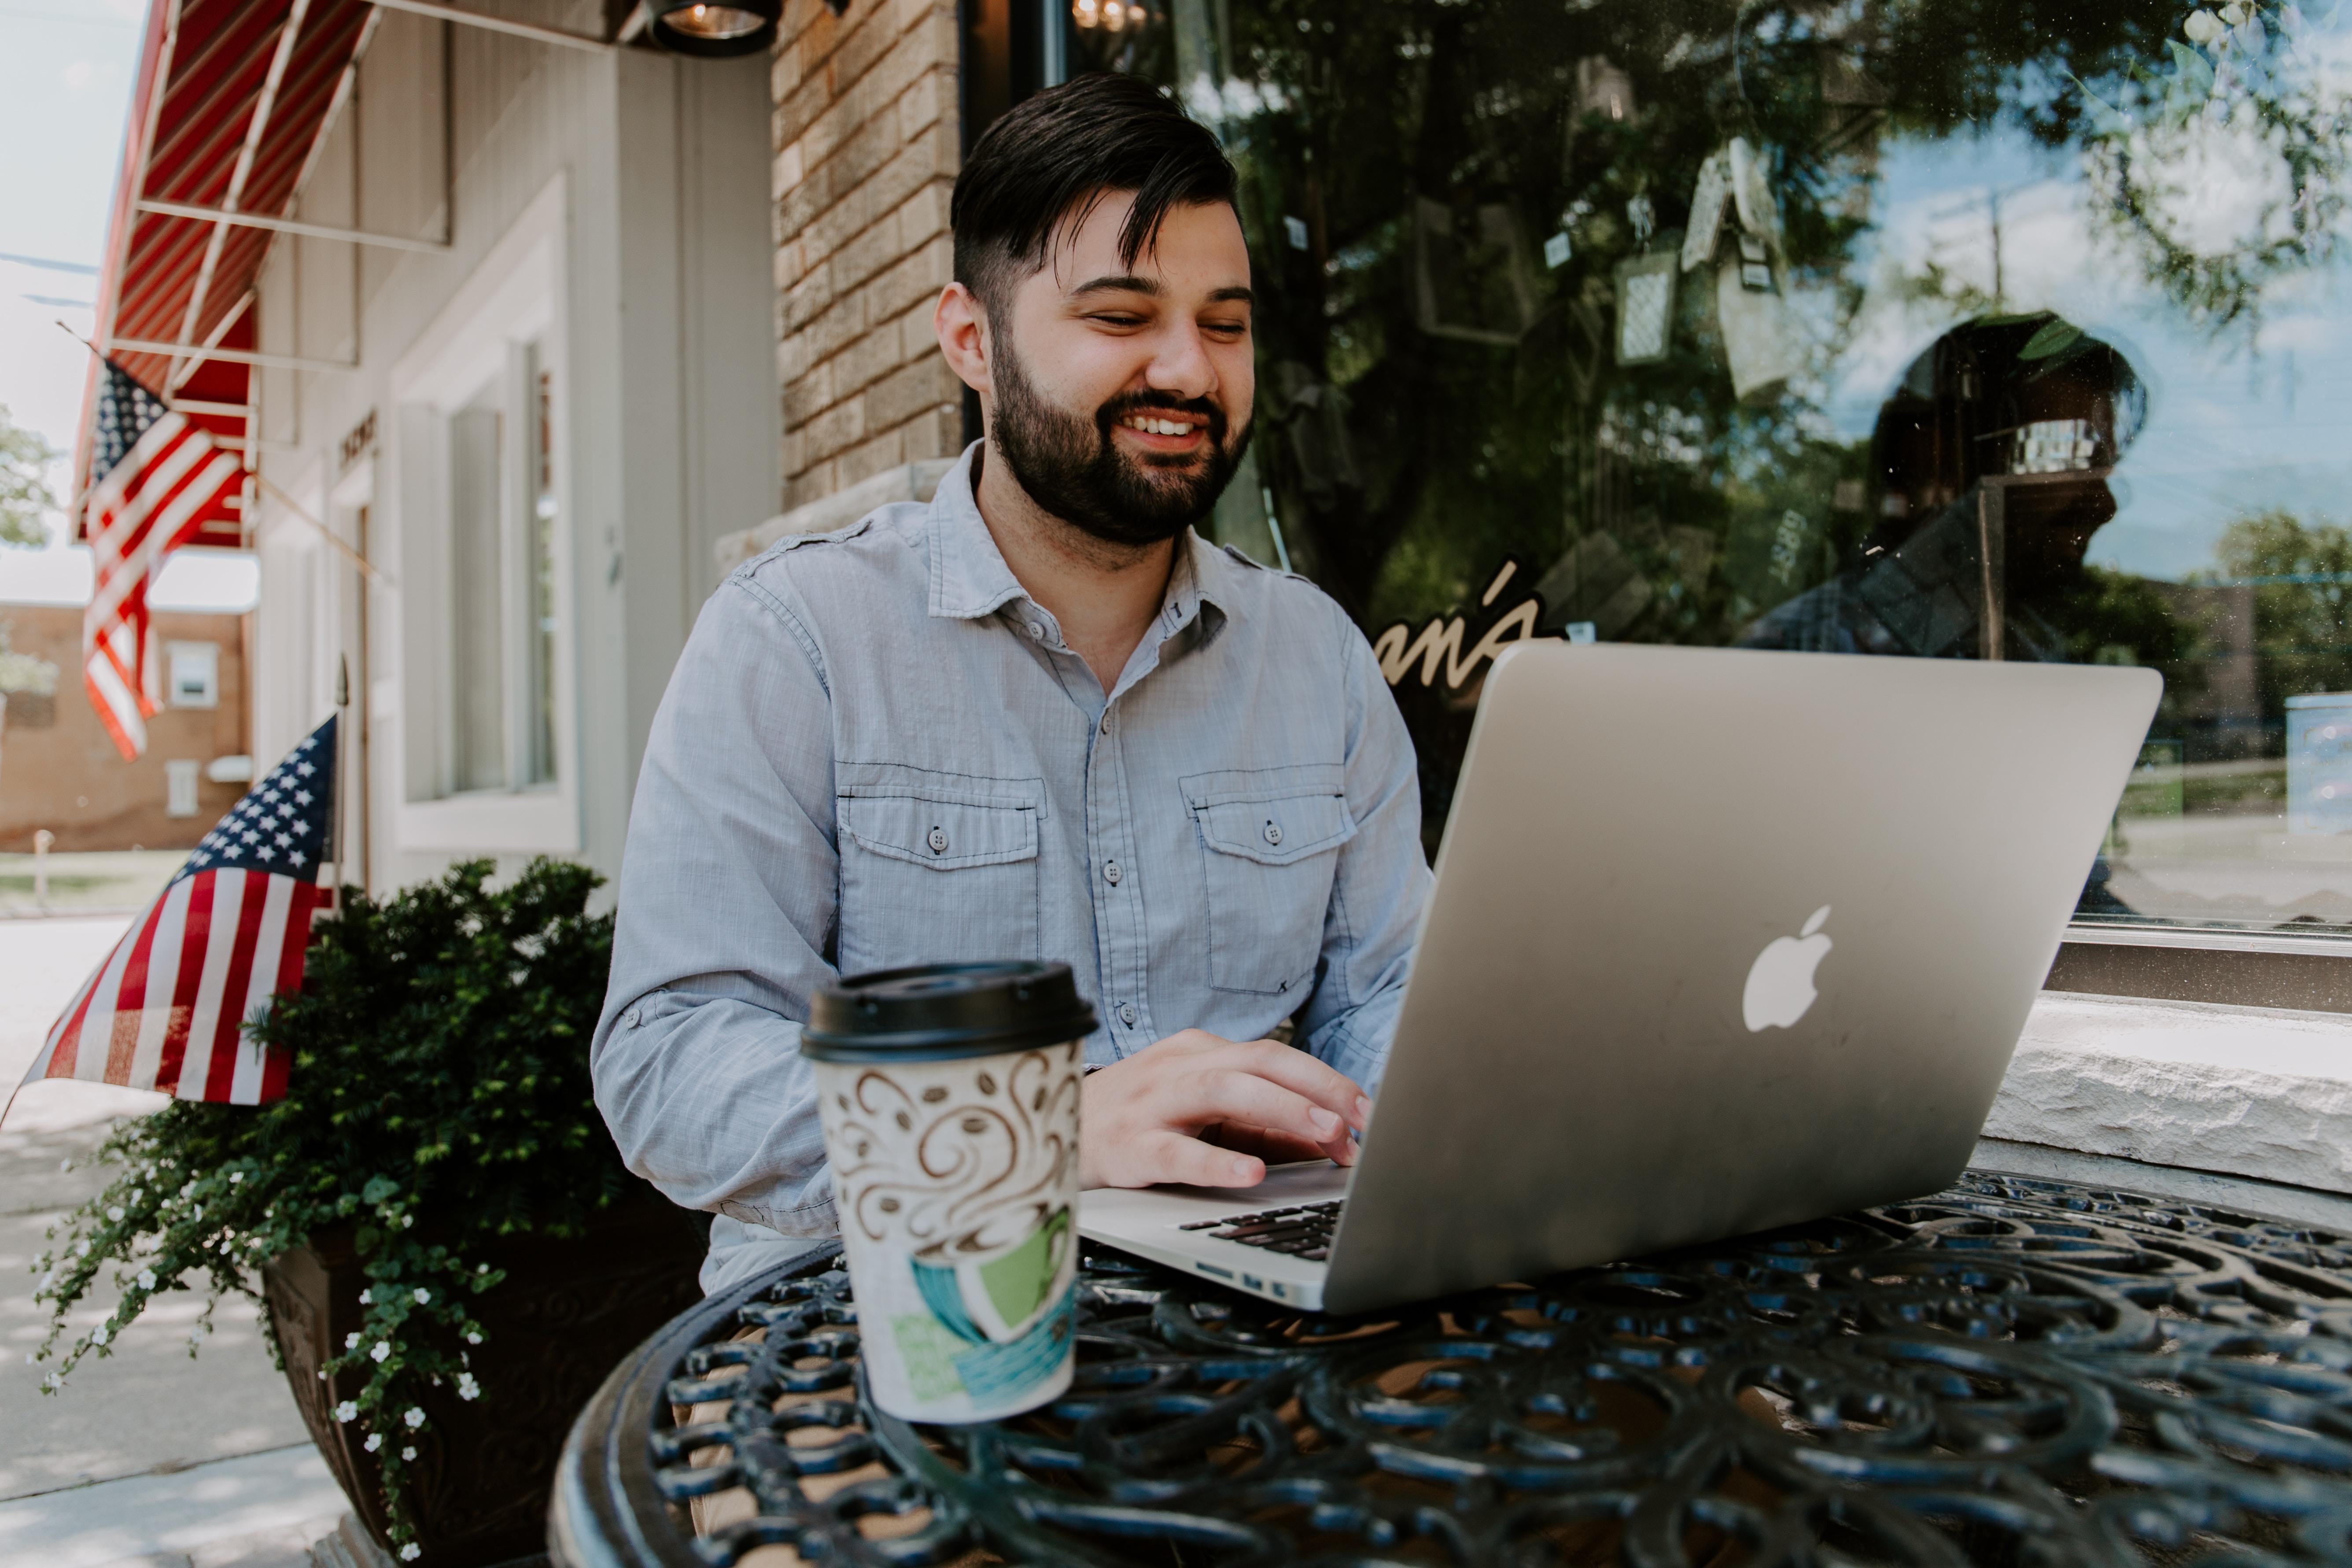 man in gray denim dress shirt smiling while using MacBook Pro